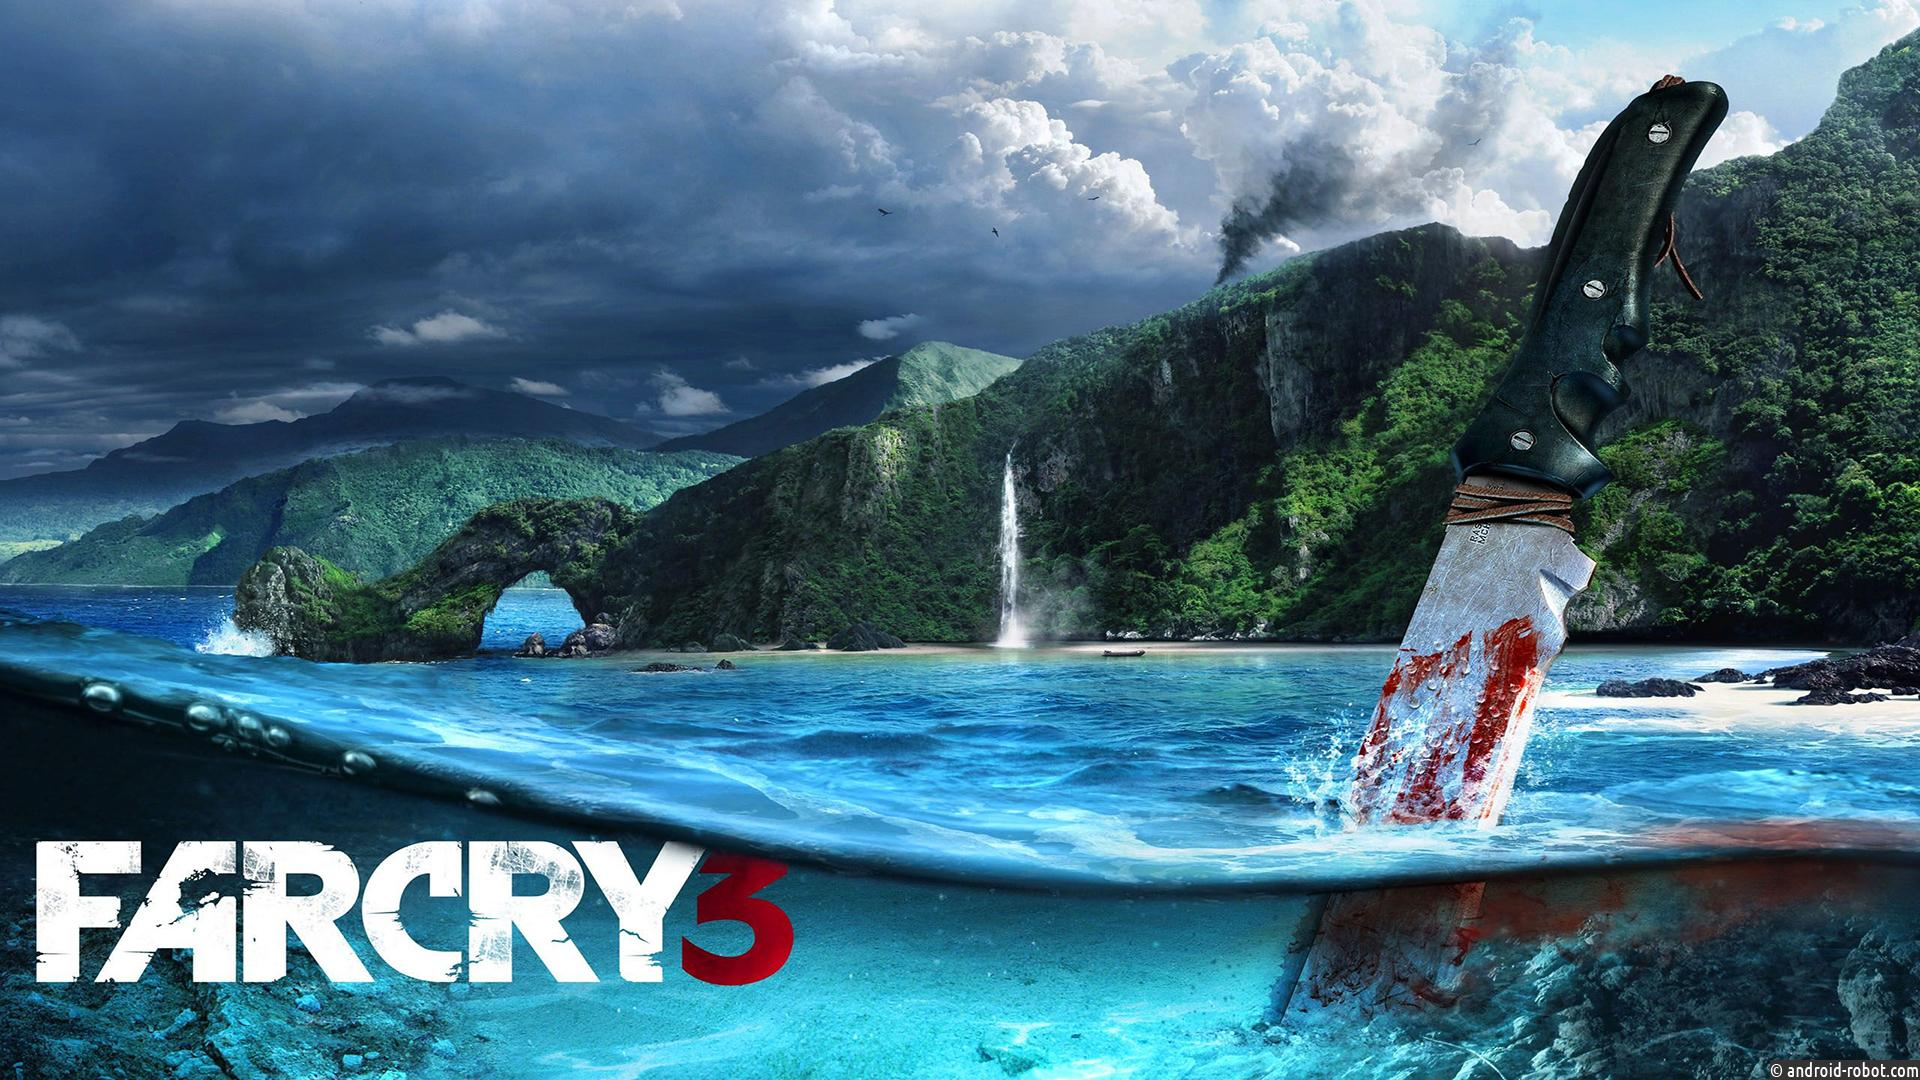 Вышел сюжетный трейлер Far Cry 5